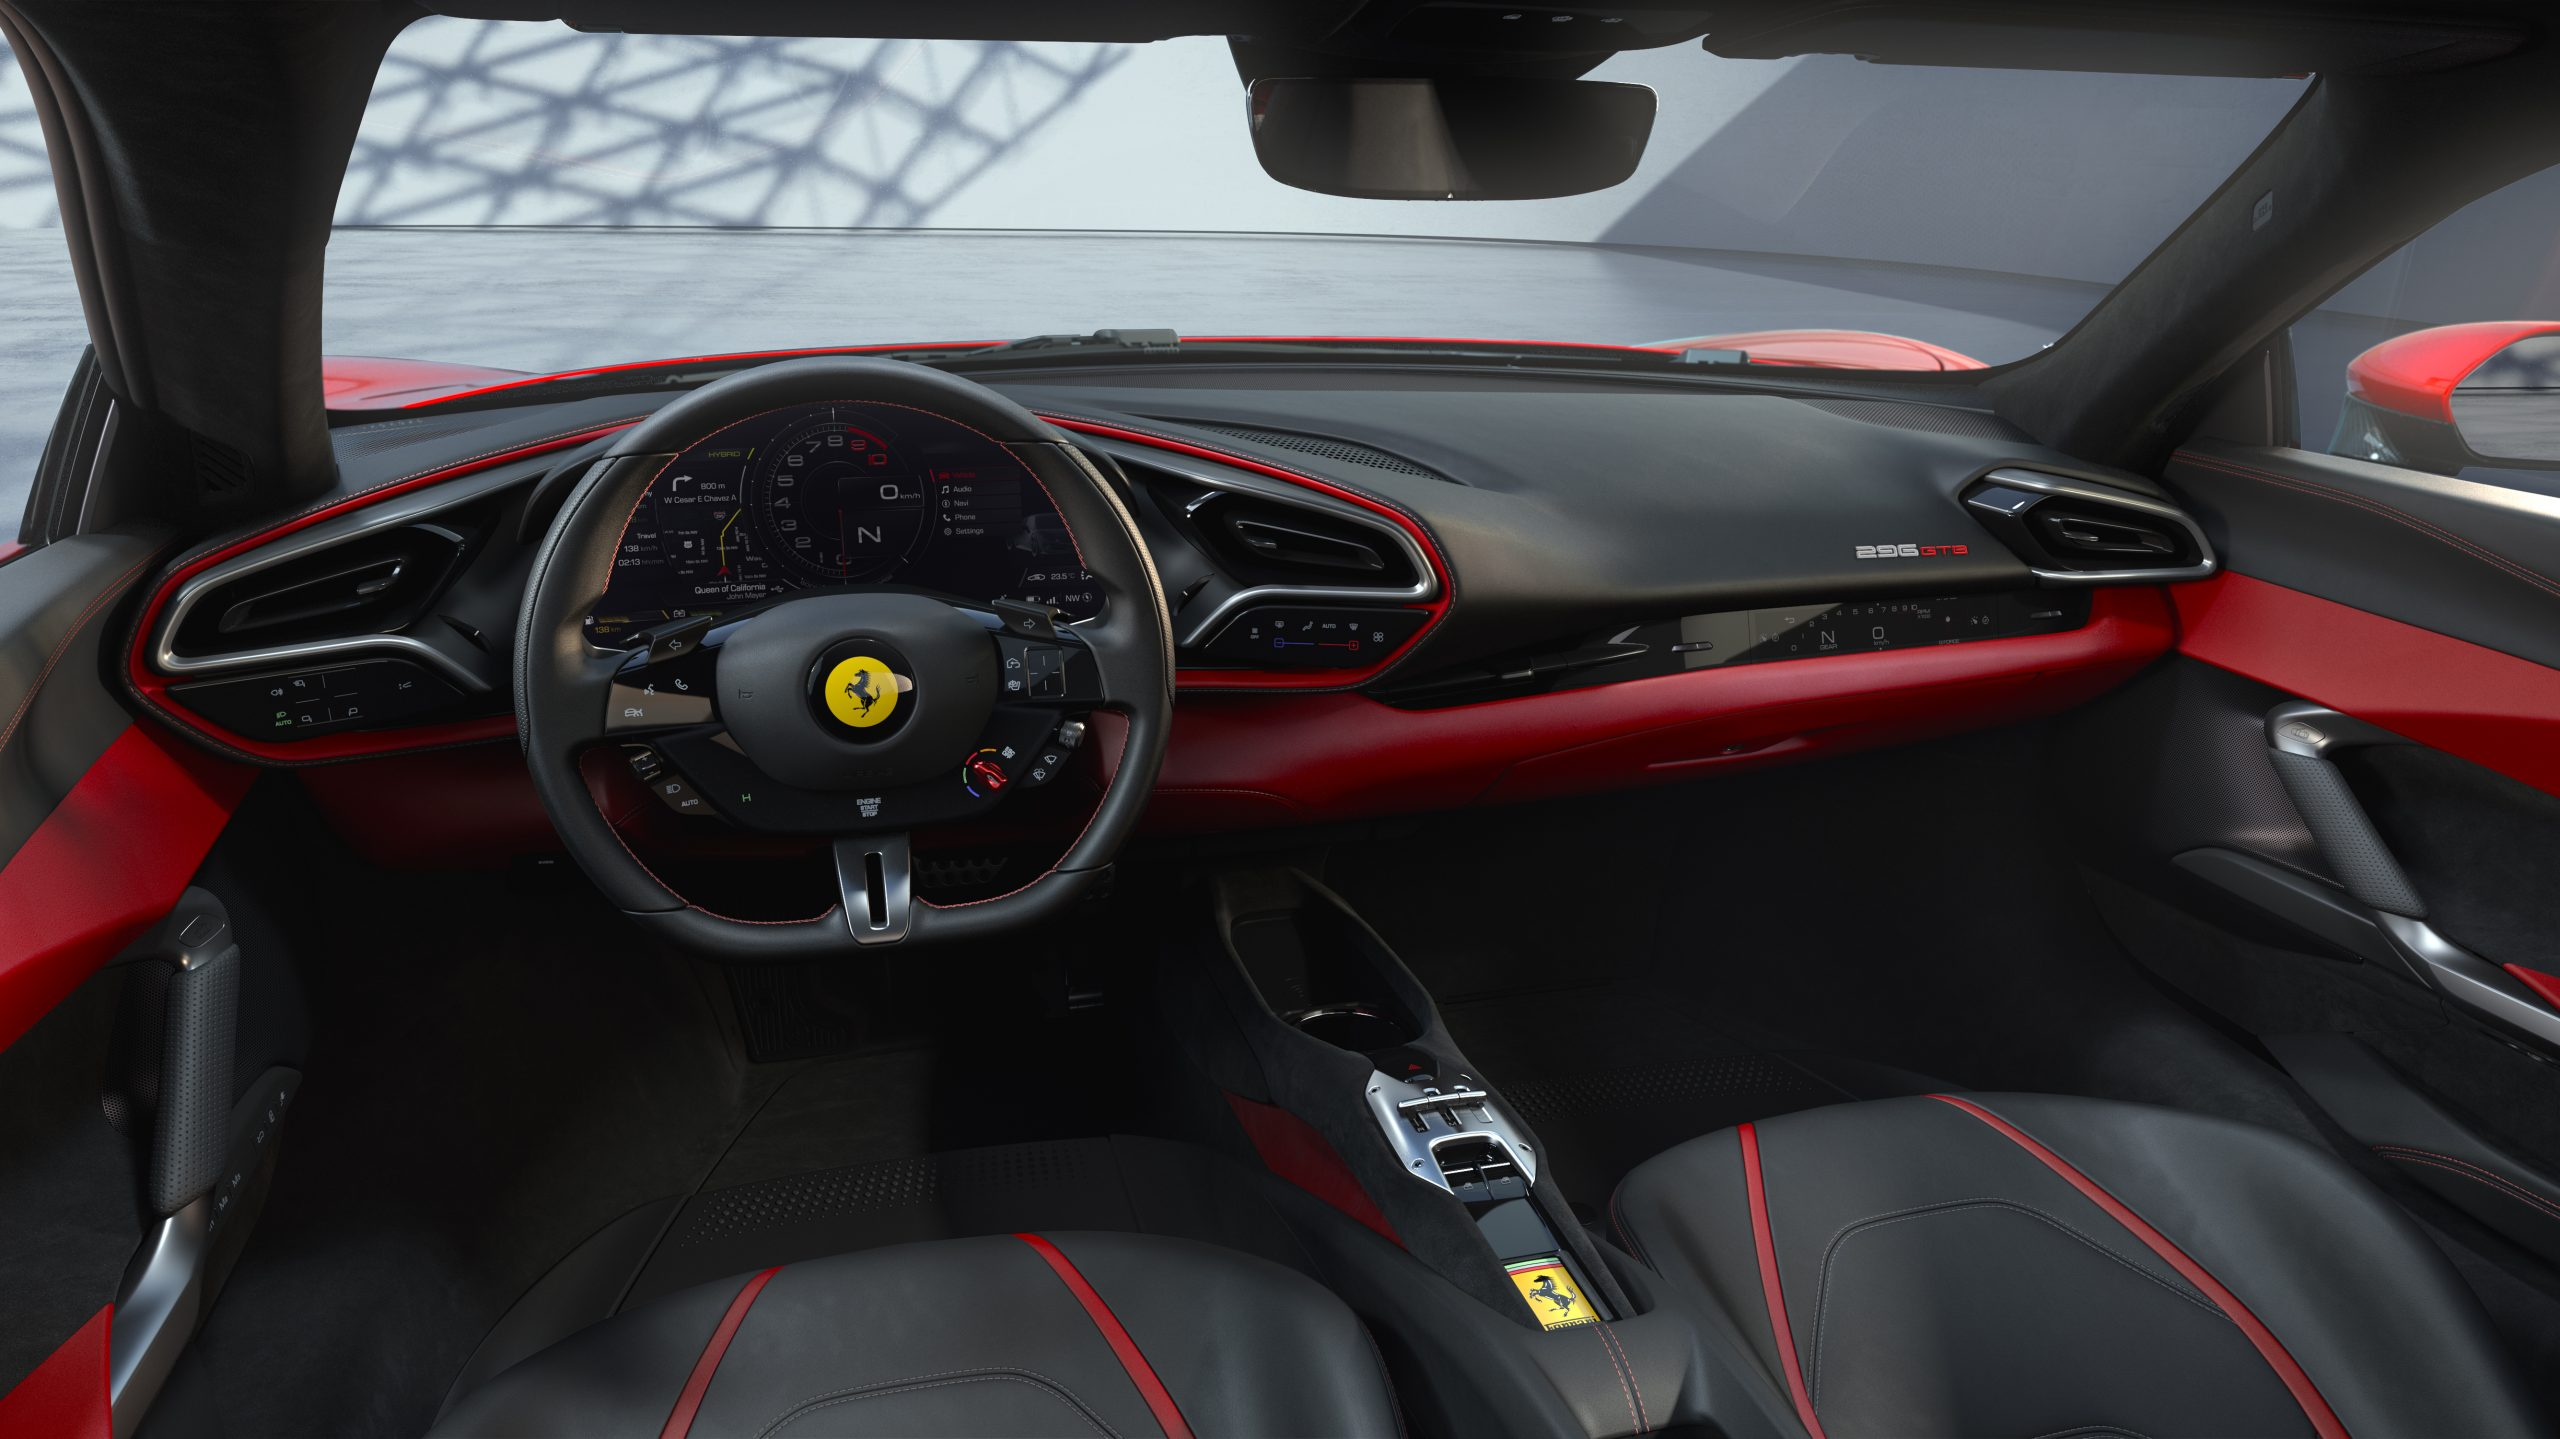 01 296 GTB Interior 34 scaled Αυτή είναι η νέα Ferrari 296GTB 296GTB, Ferrari, Ferrari 296GTB, supercar, supercars, zblog, ειδήσεις, Νέα